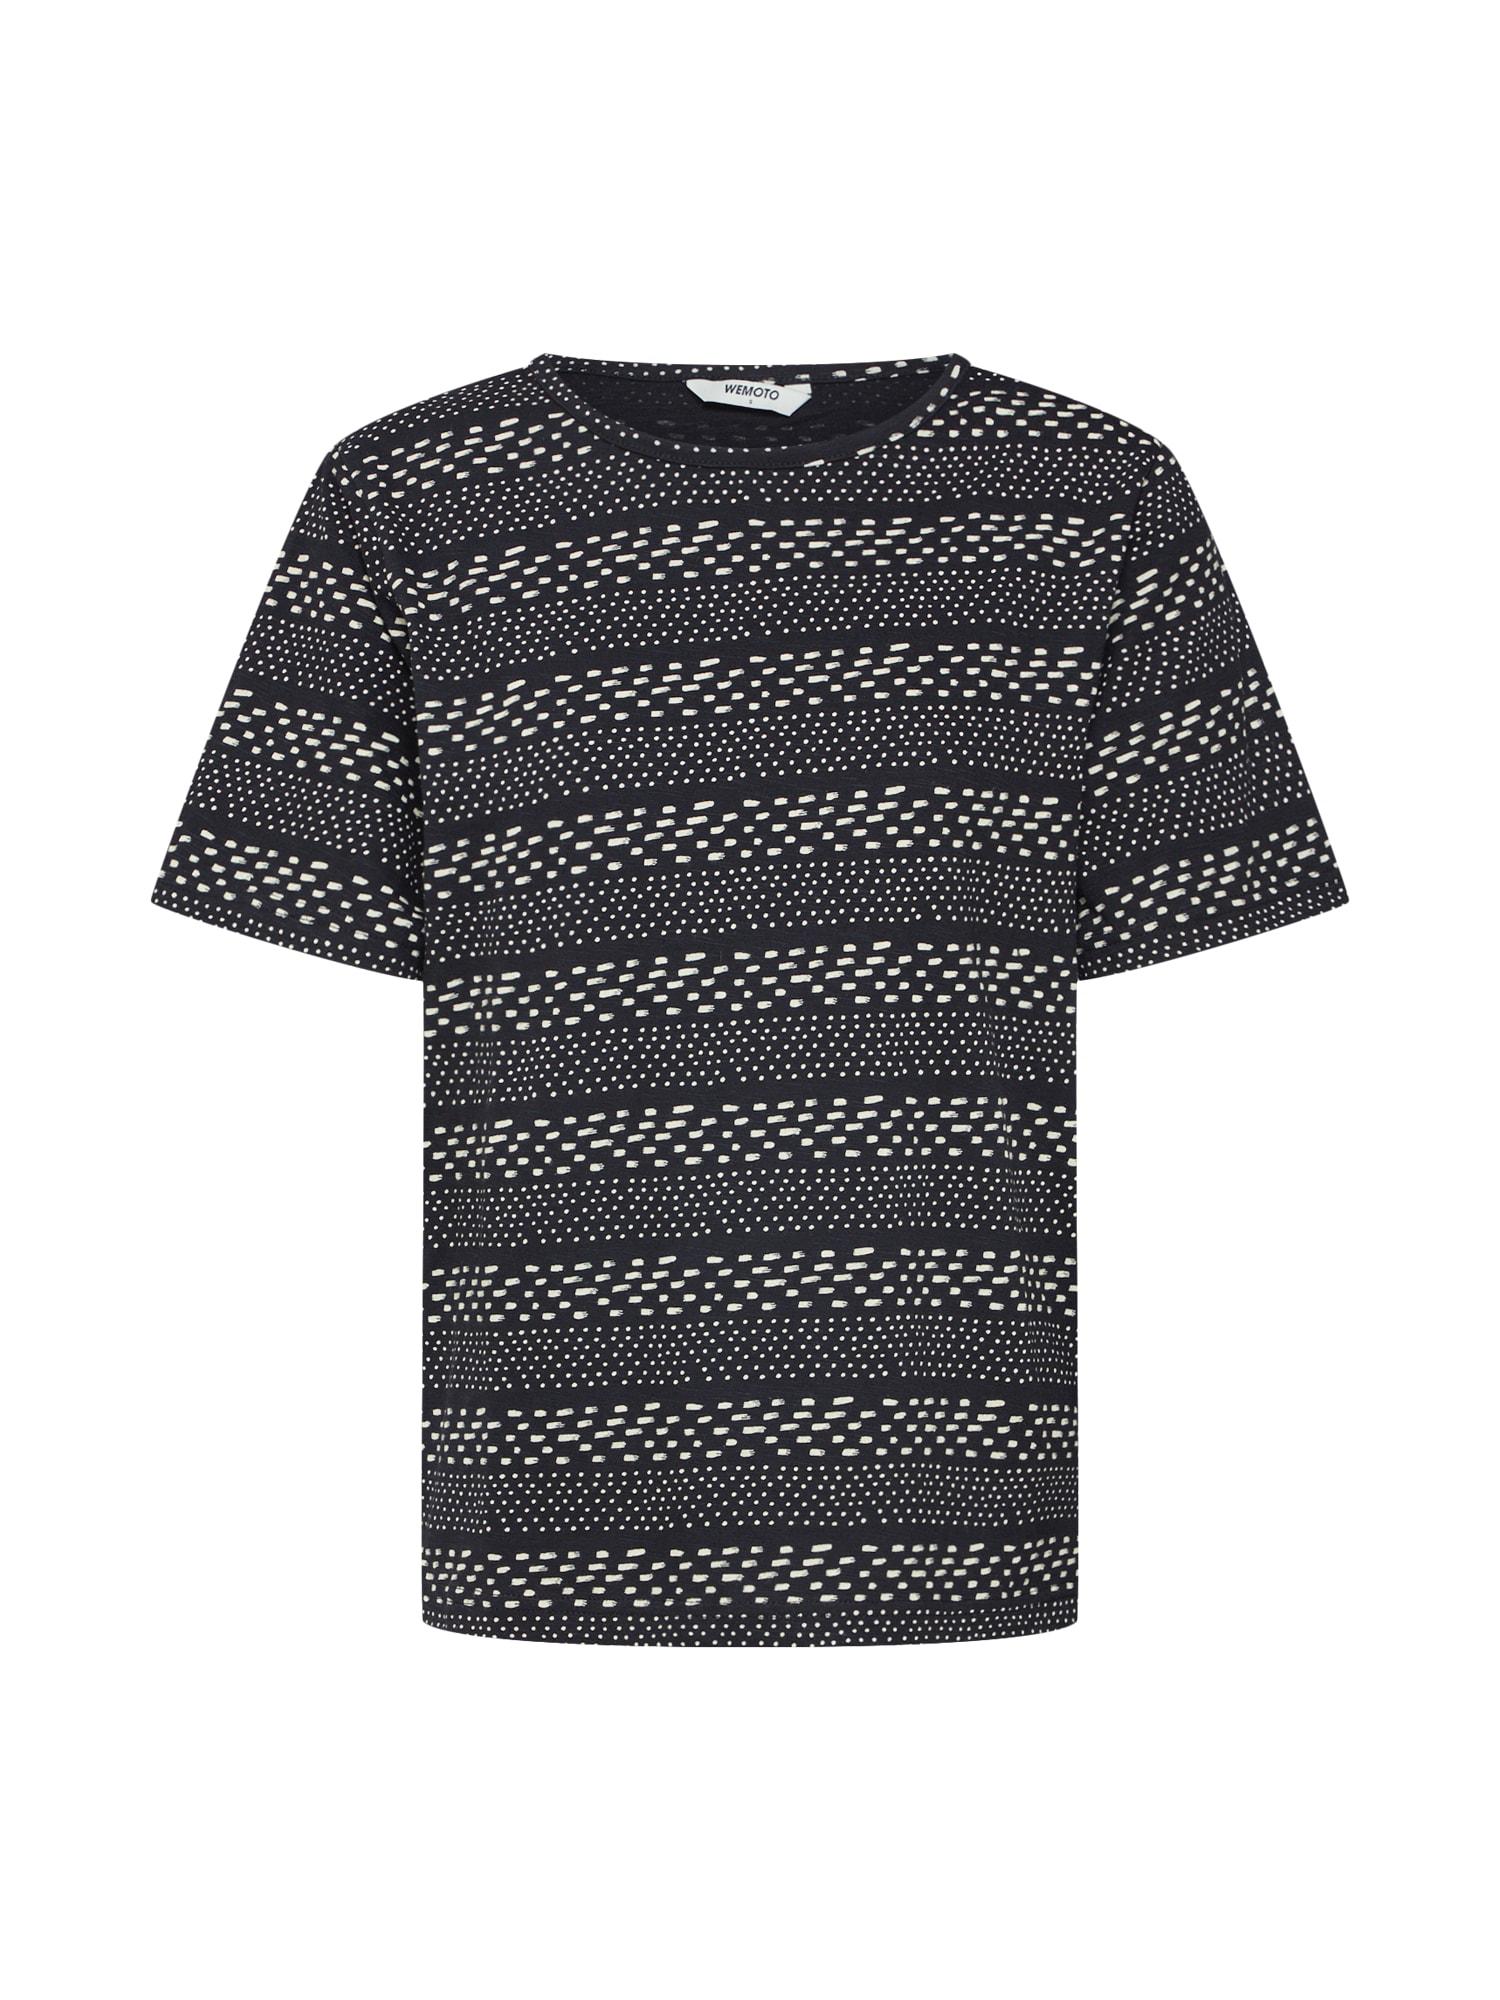 Tričko Holden Printed černá bílá Wemoto